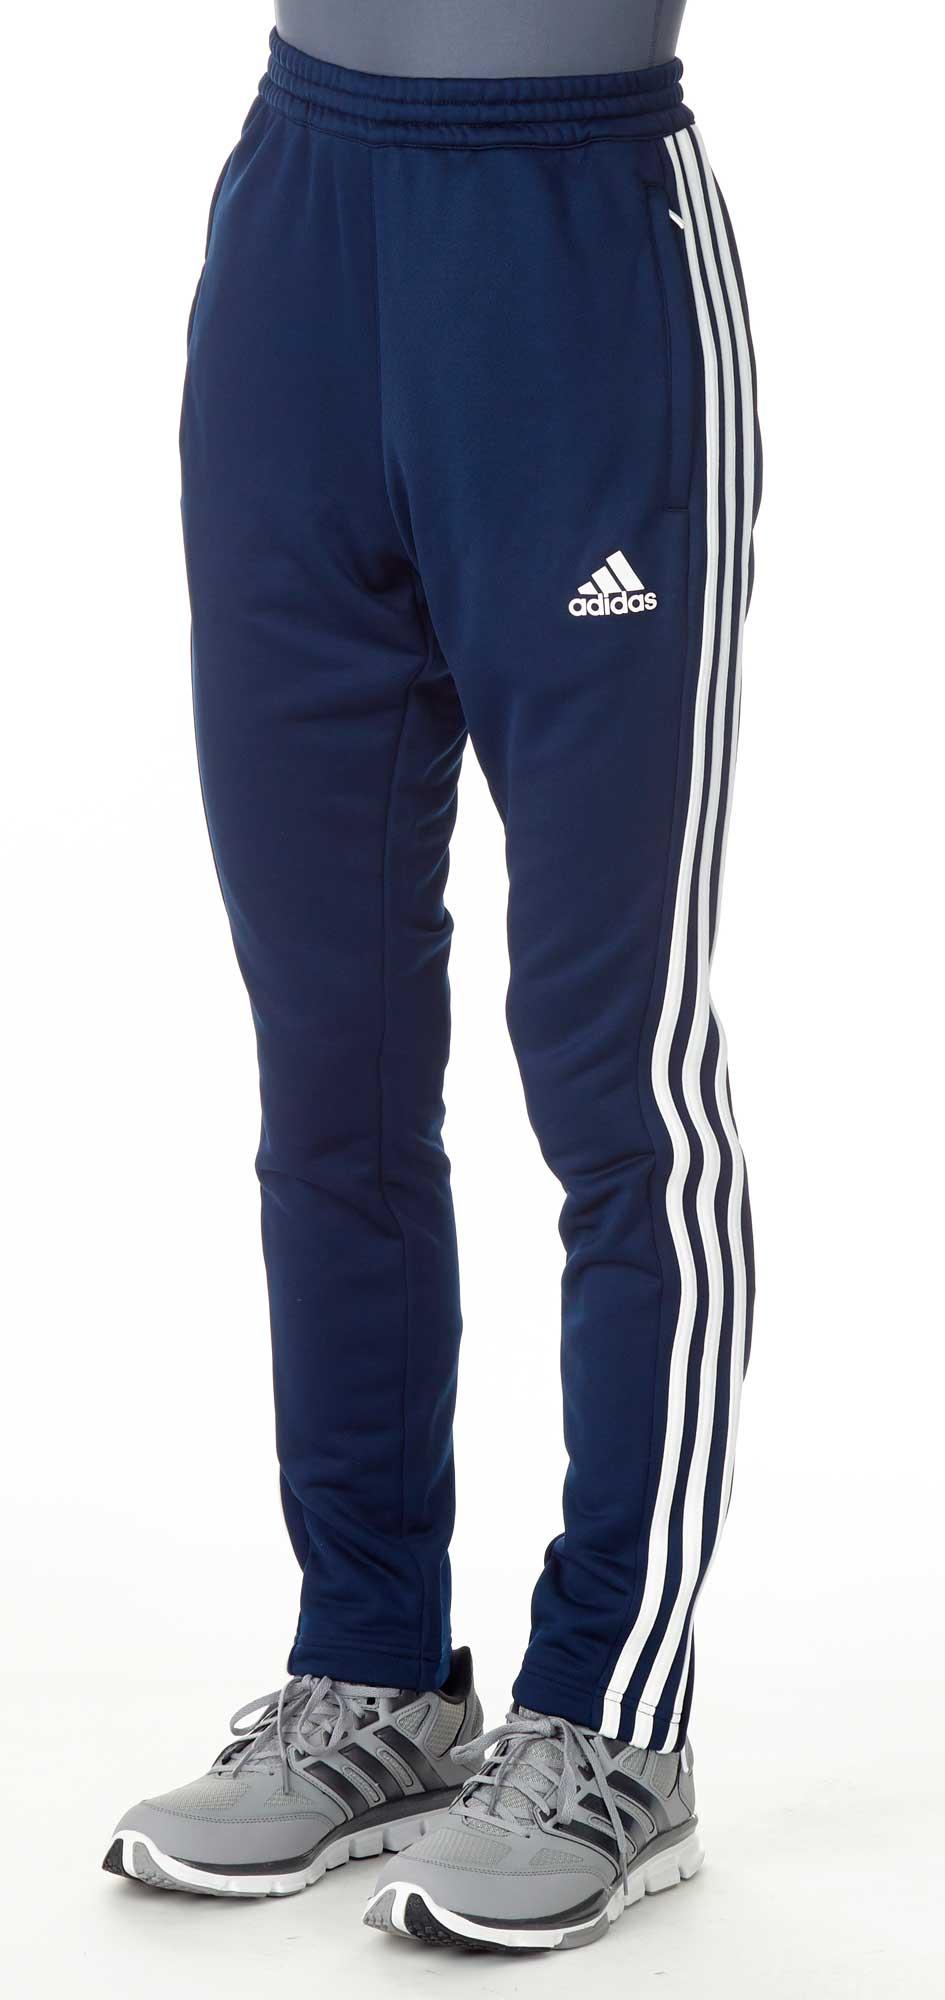 adidas T16 Team Sweat Hose Männer navy blau weiß AJ5396